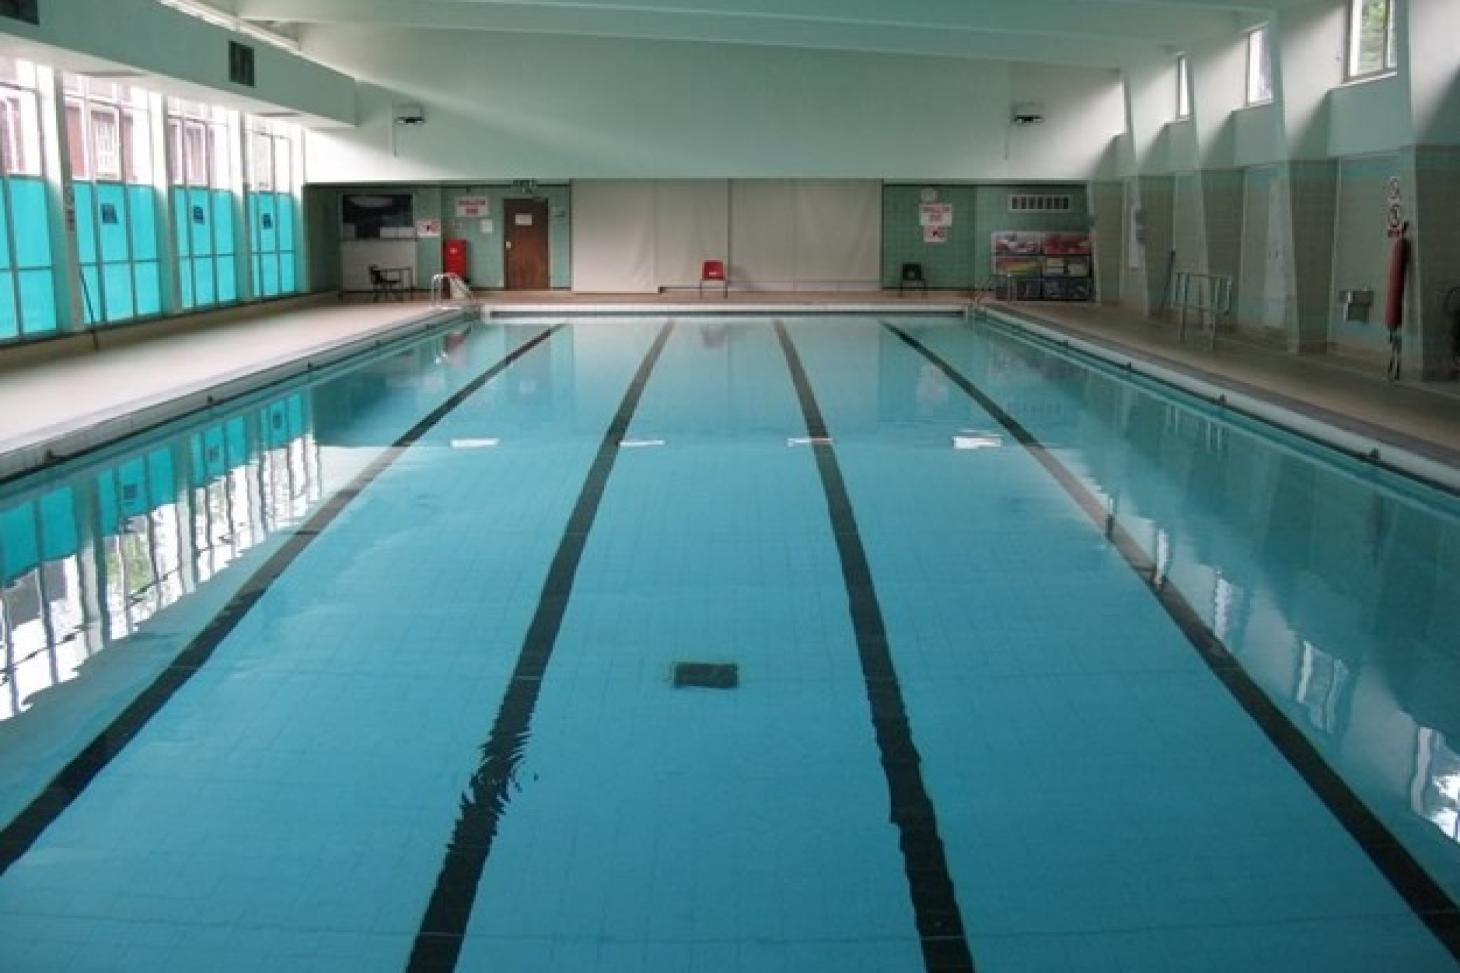 Denbigh High School Indoor swimming pool